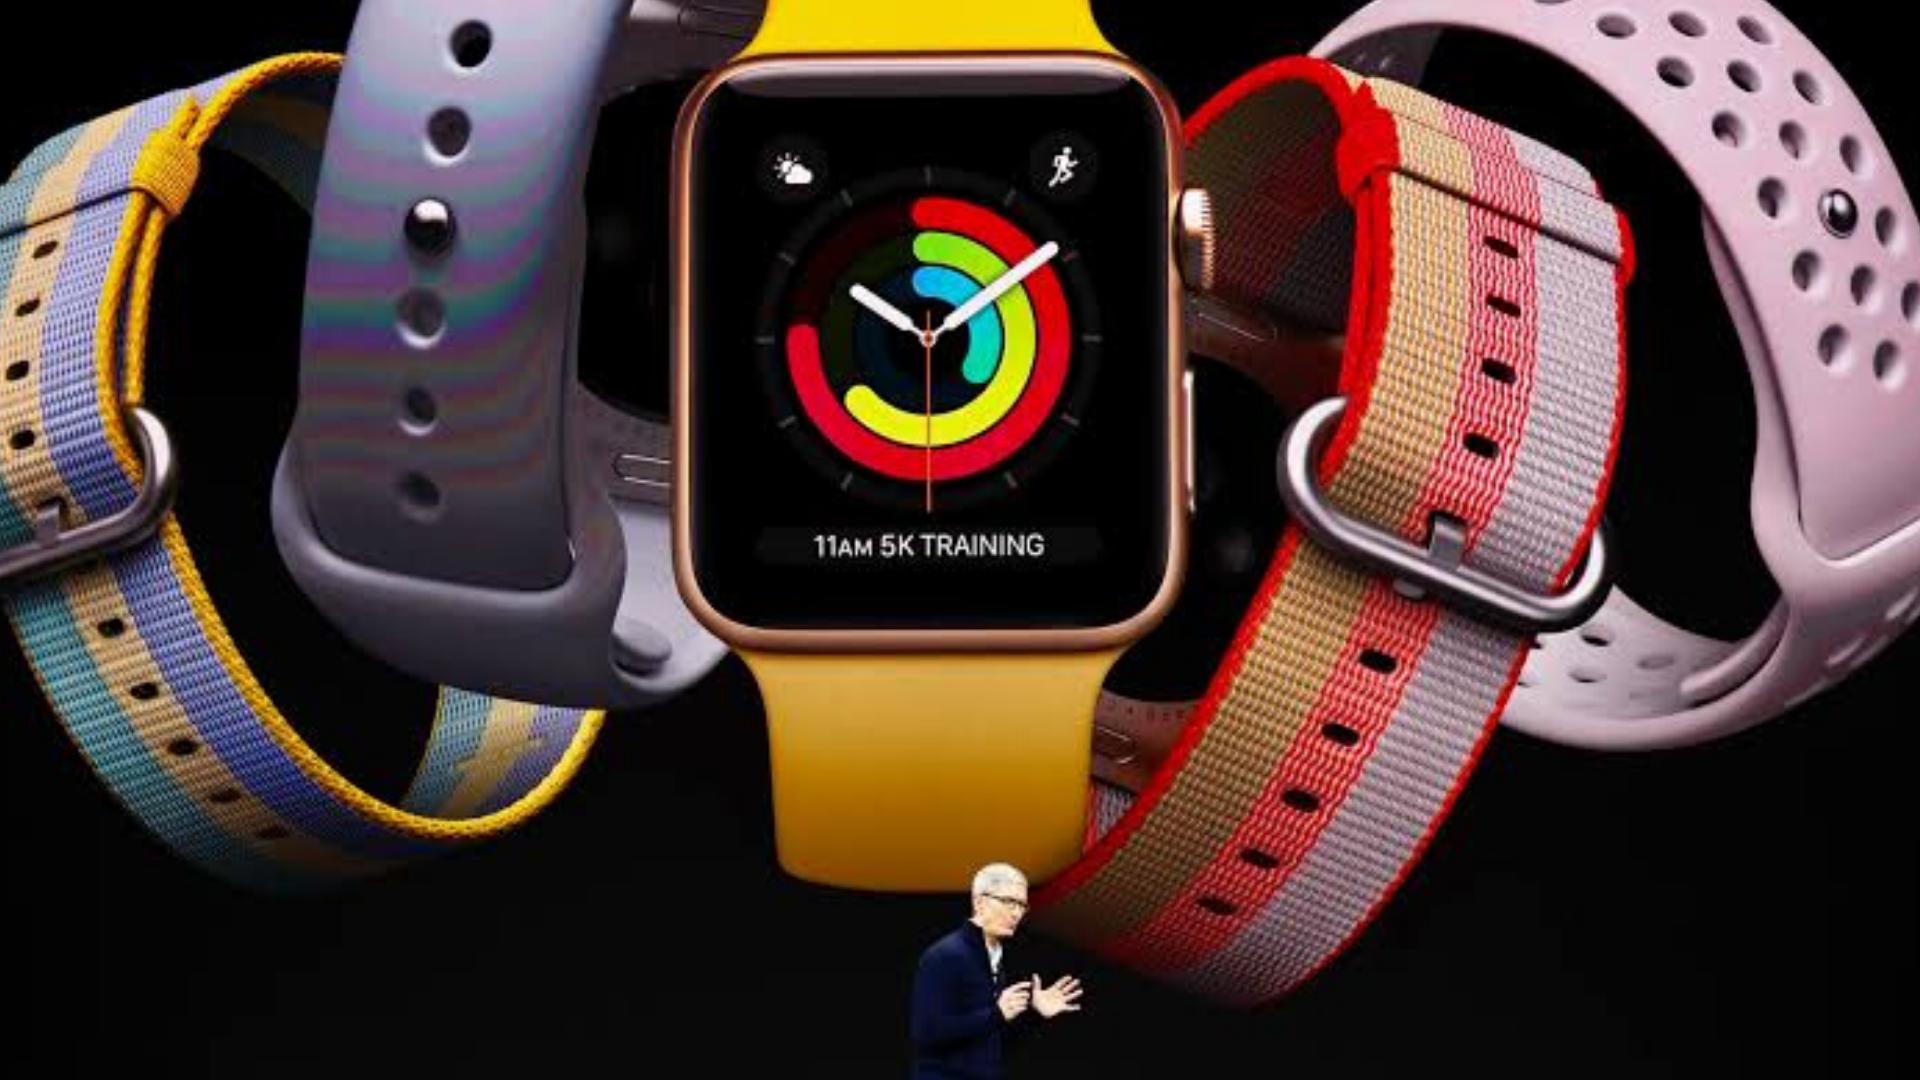 Apple Watch detects irregular heartbeats : Finds US study